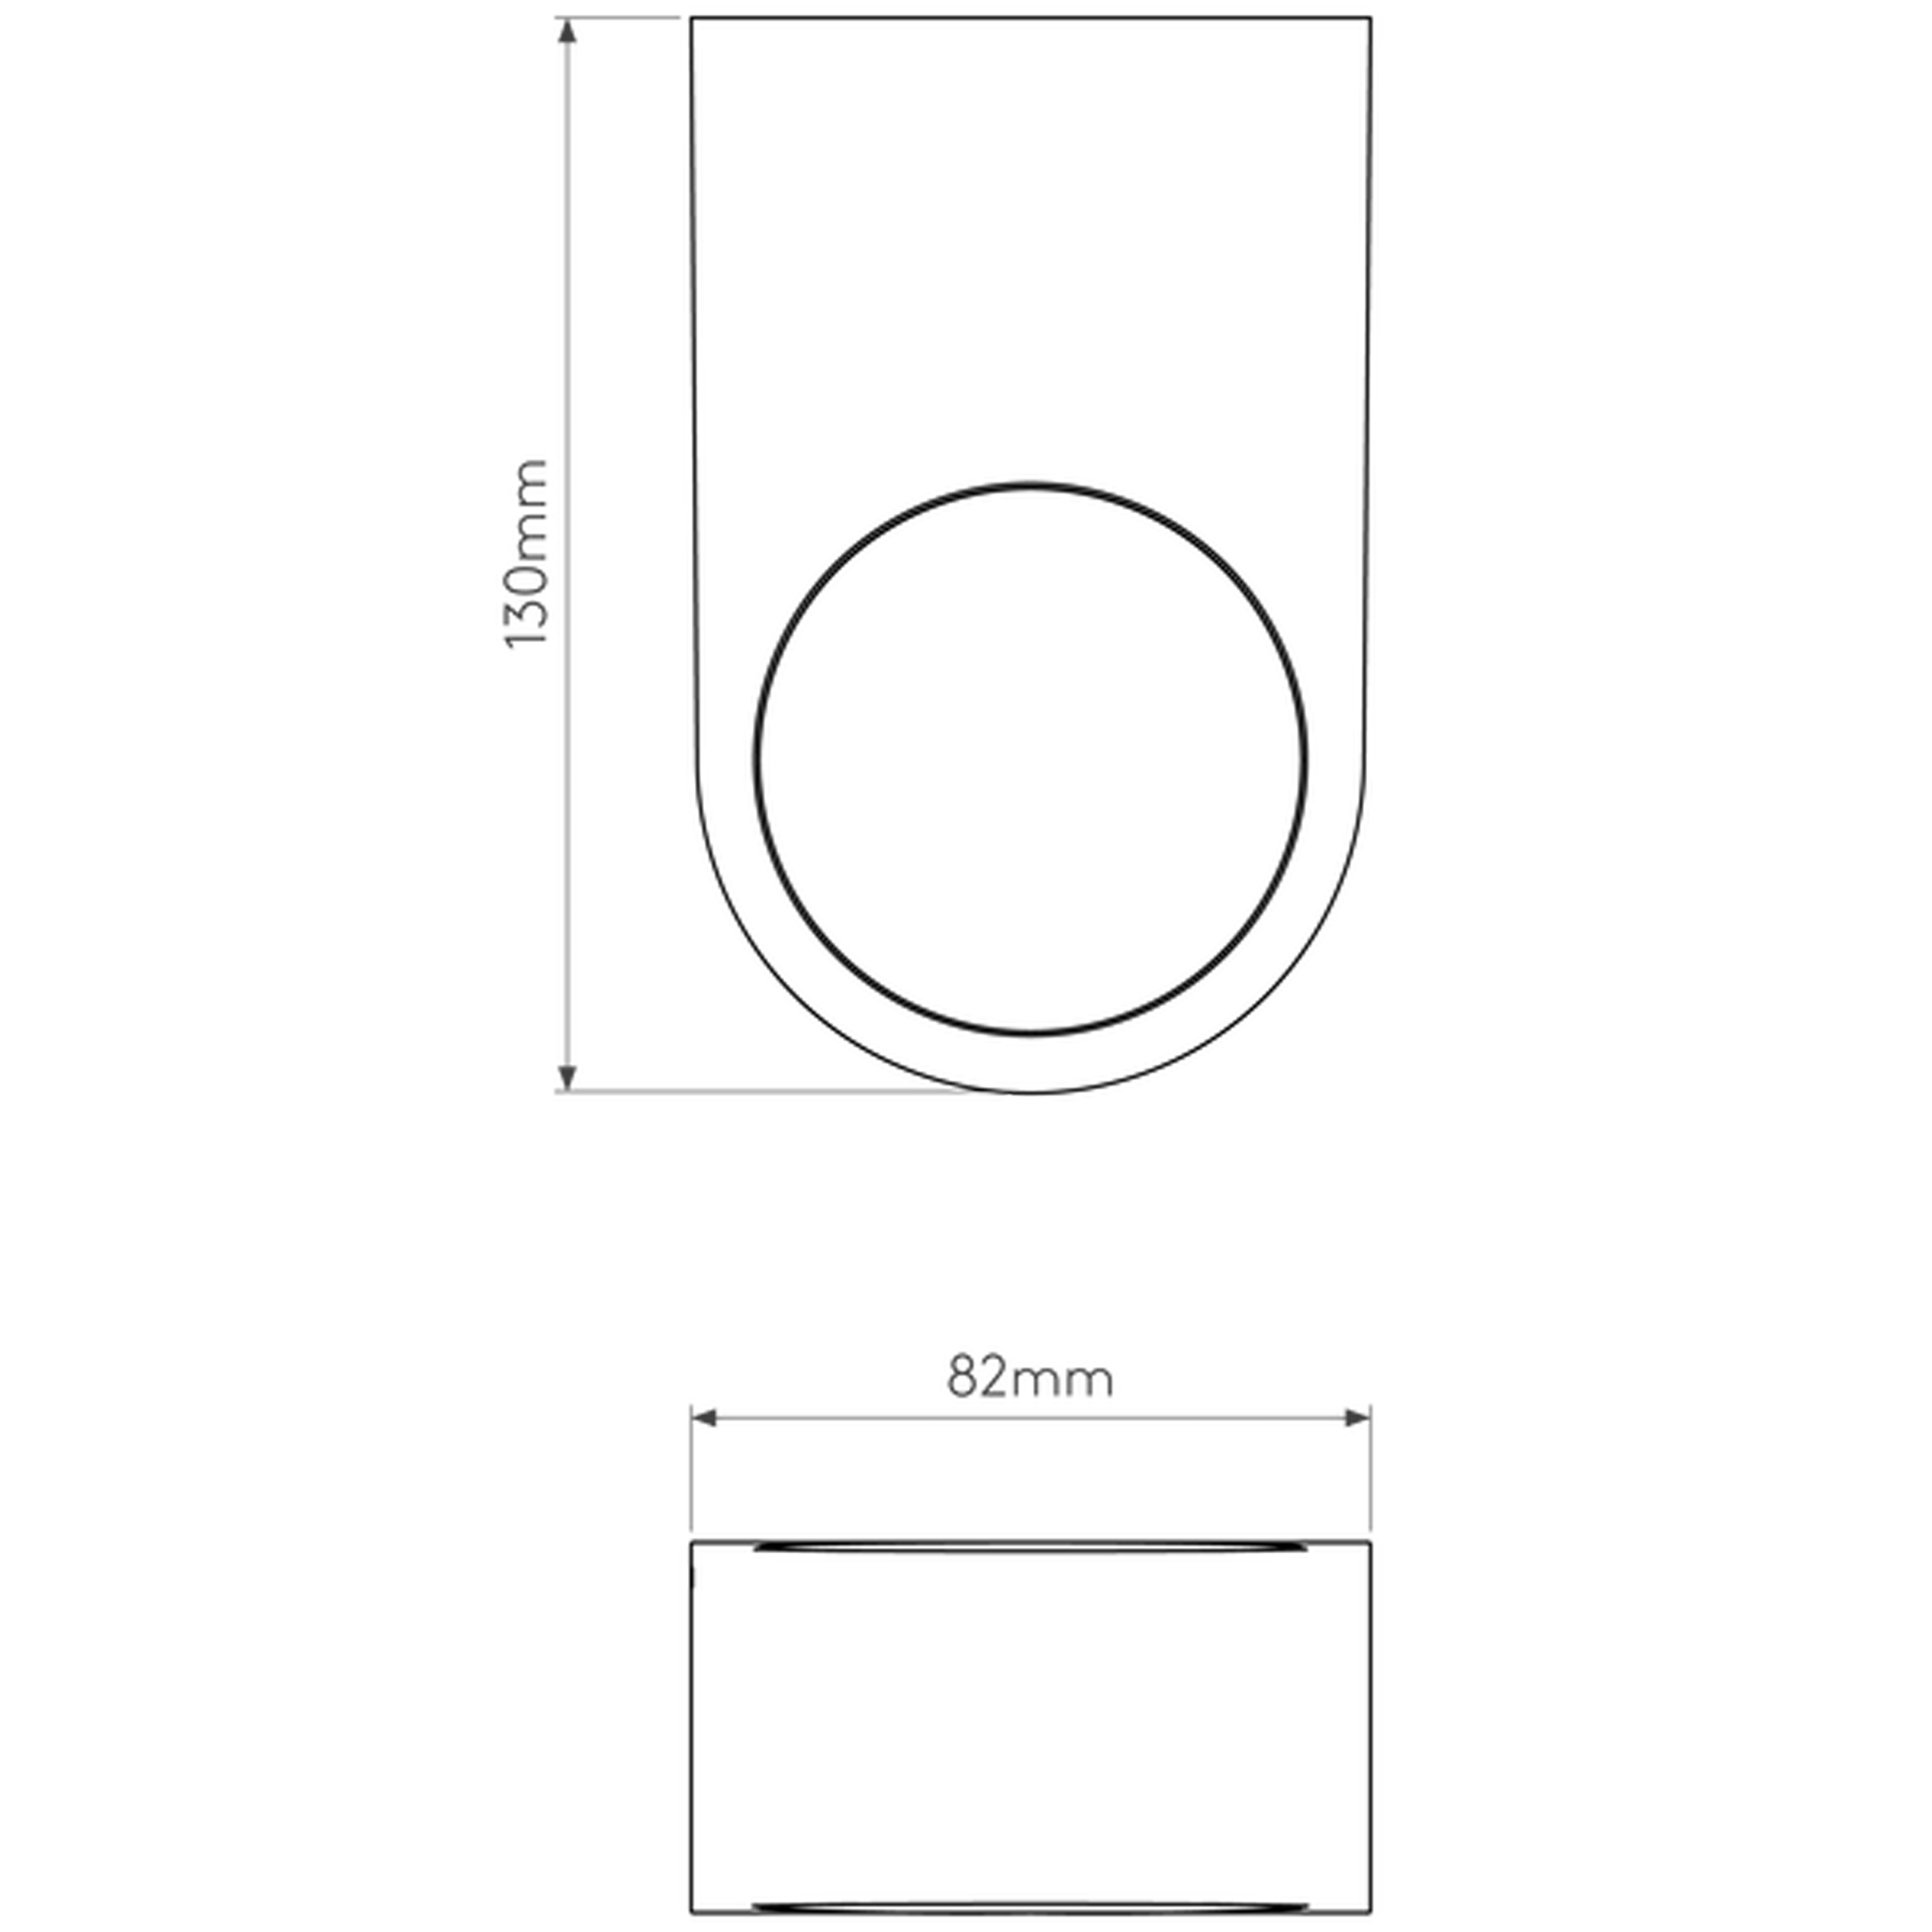 Astro Epsilon Led Wall Light Line Drawing